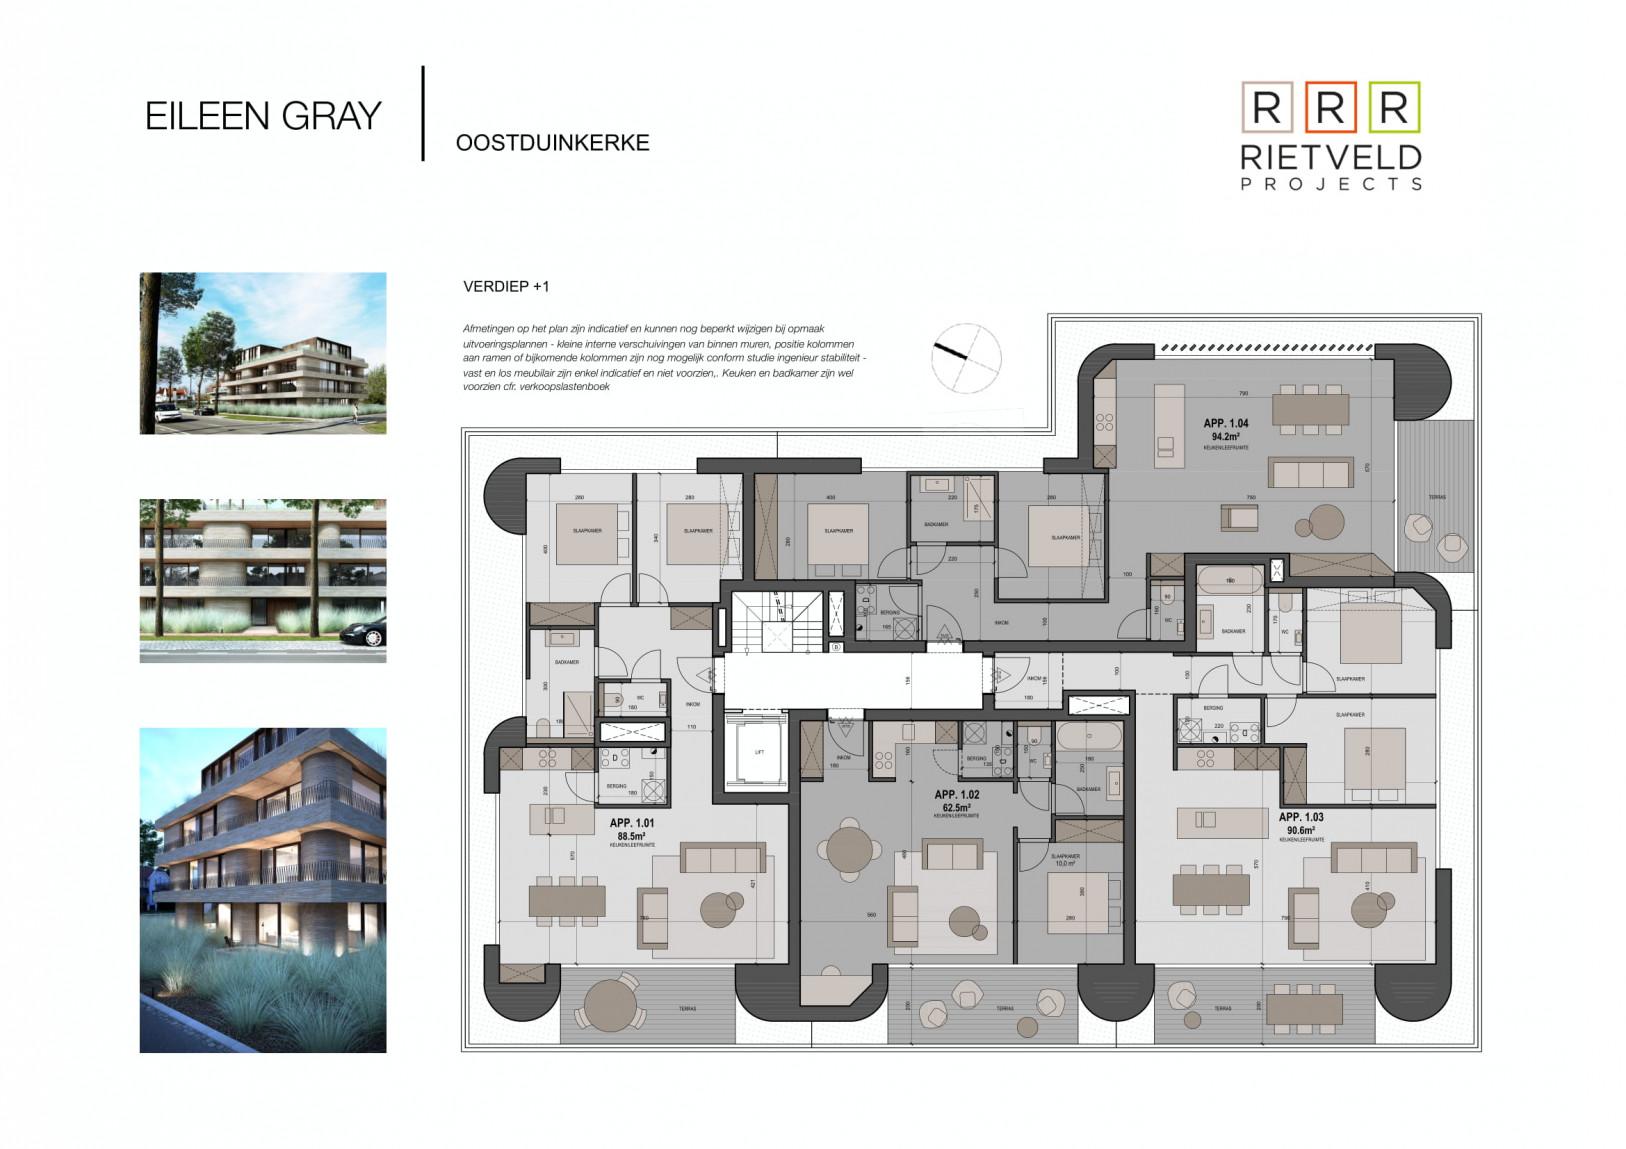 Eileen Gray - Rietveld Projects - Verdiepig 1